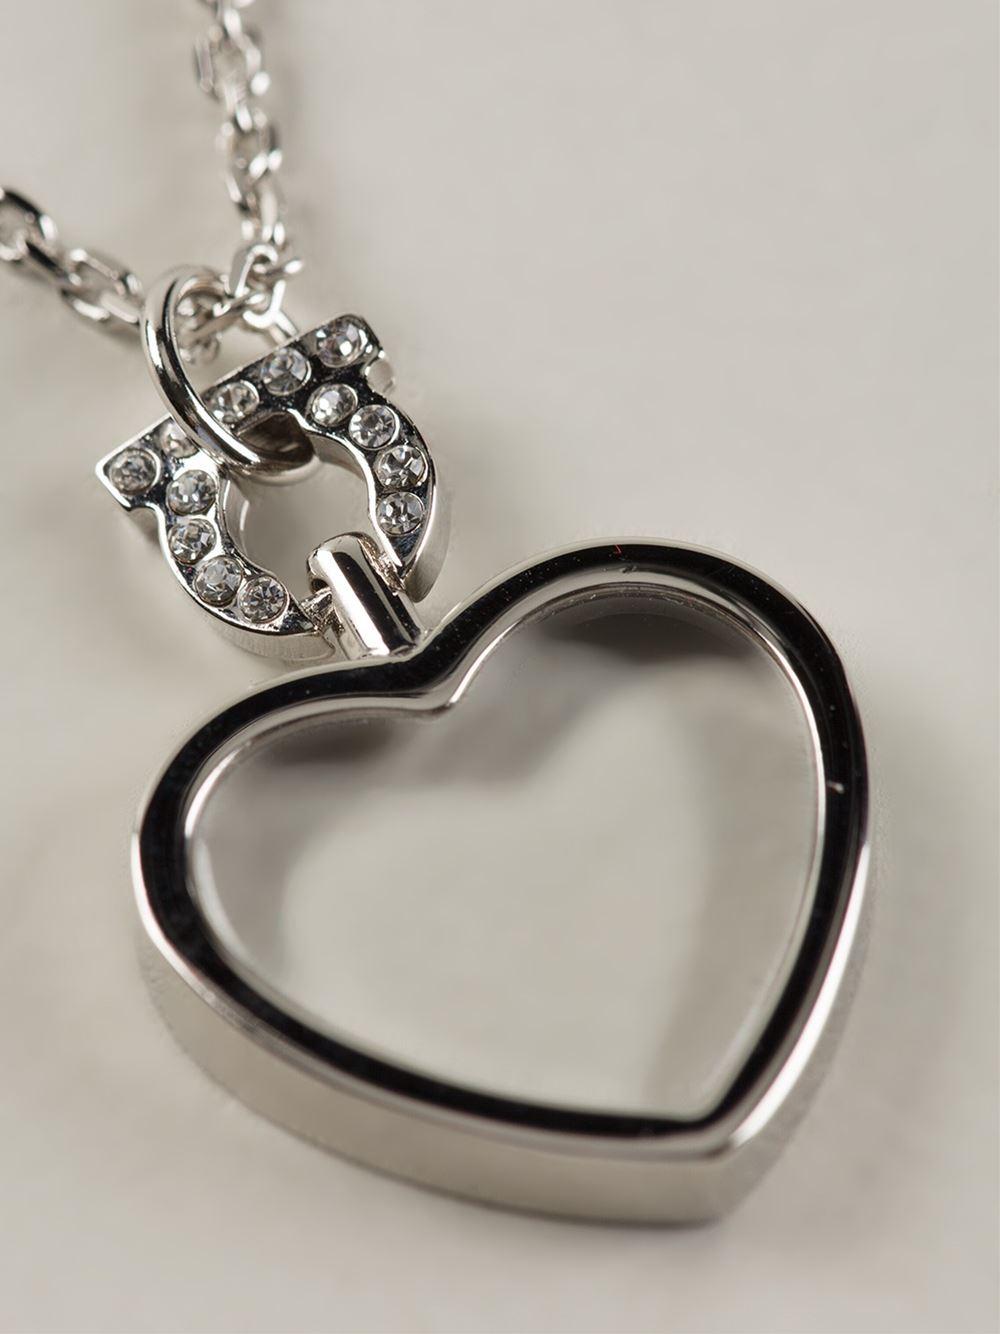 Ferragamo Heart Pendant Necklace in Metallic